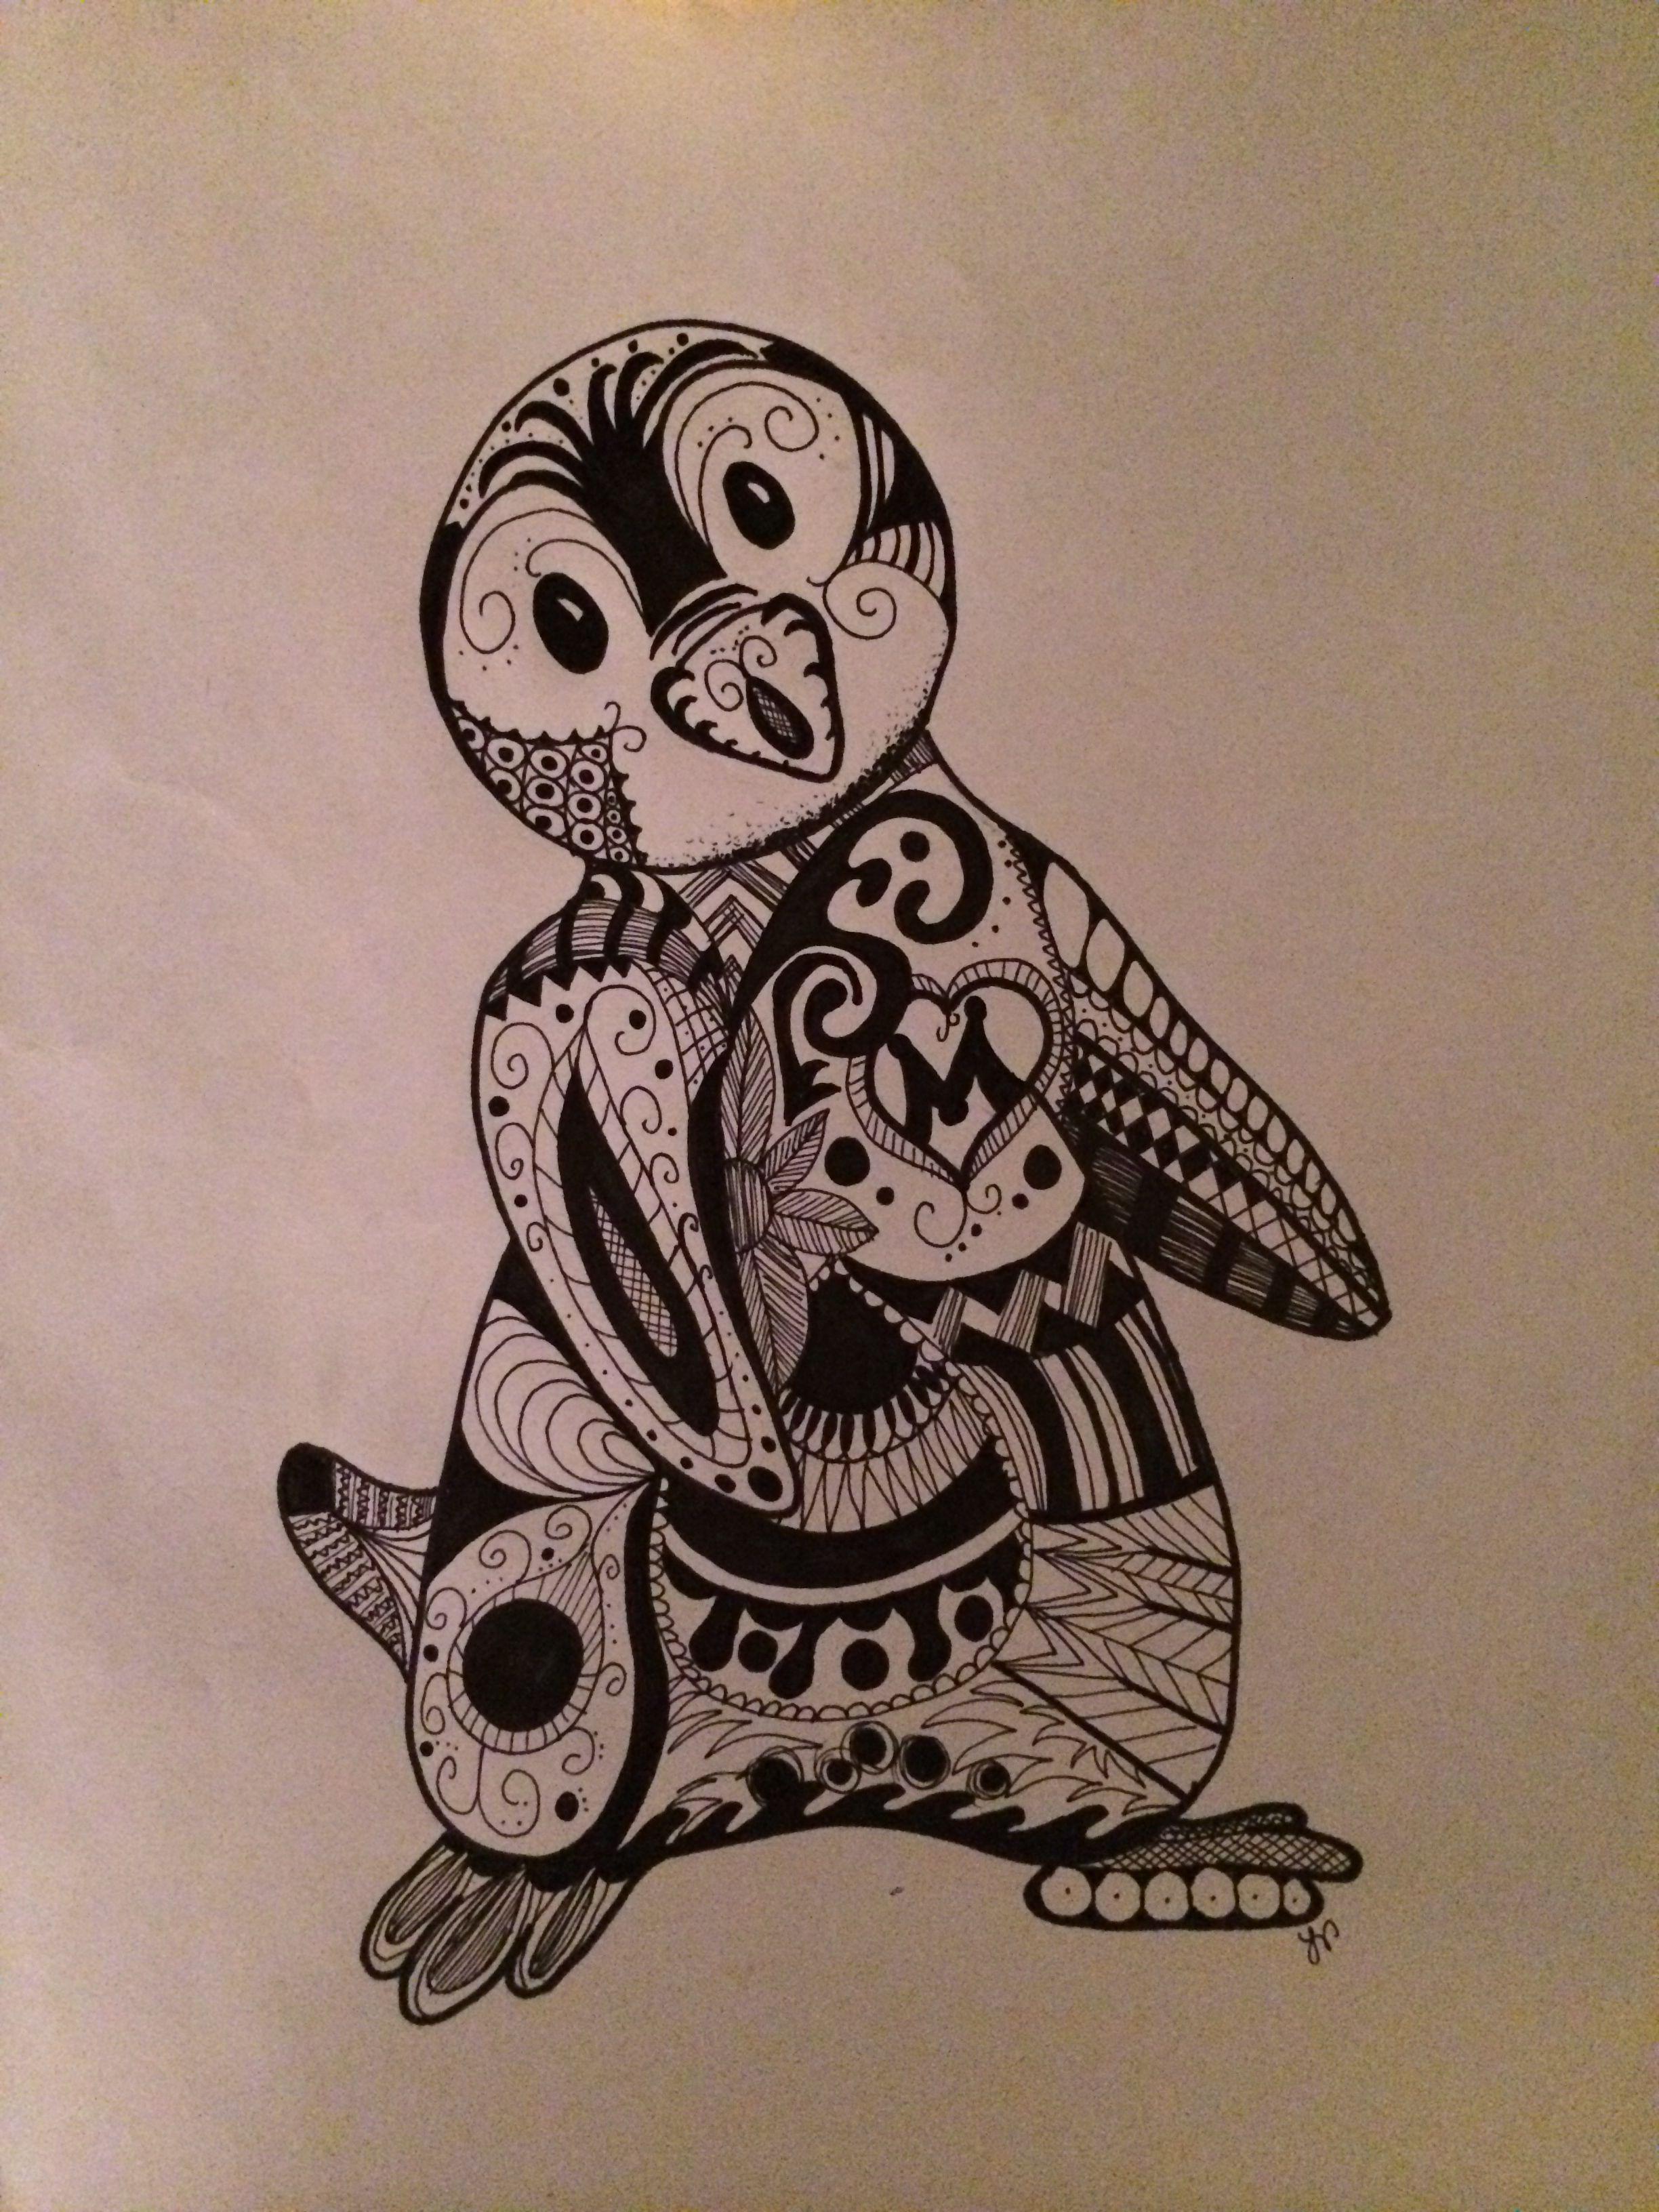 Drawings by me LAV #sharpie